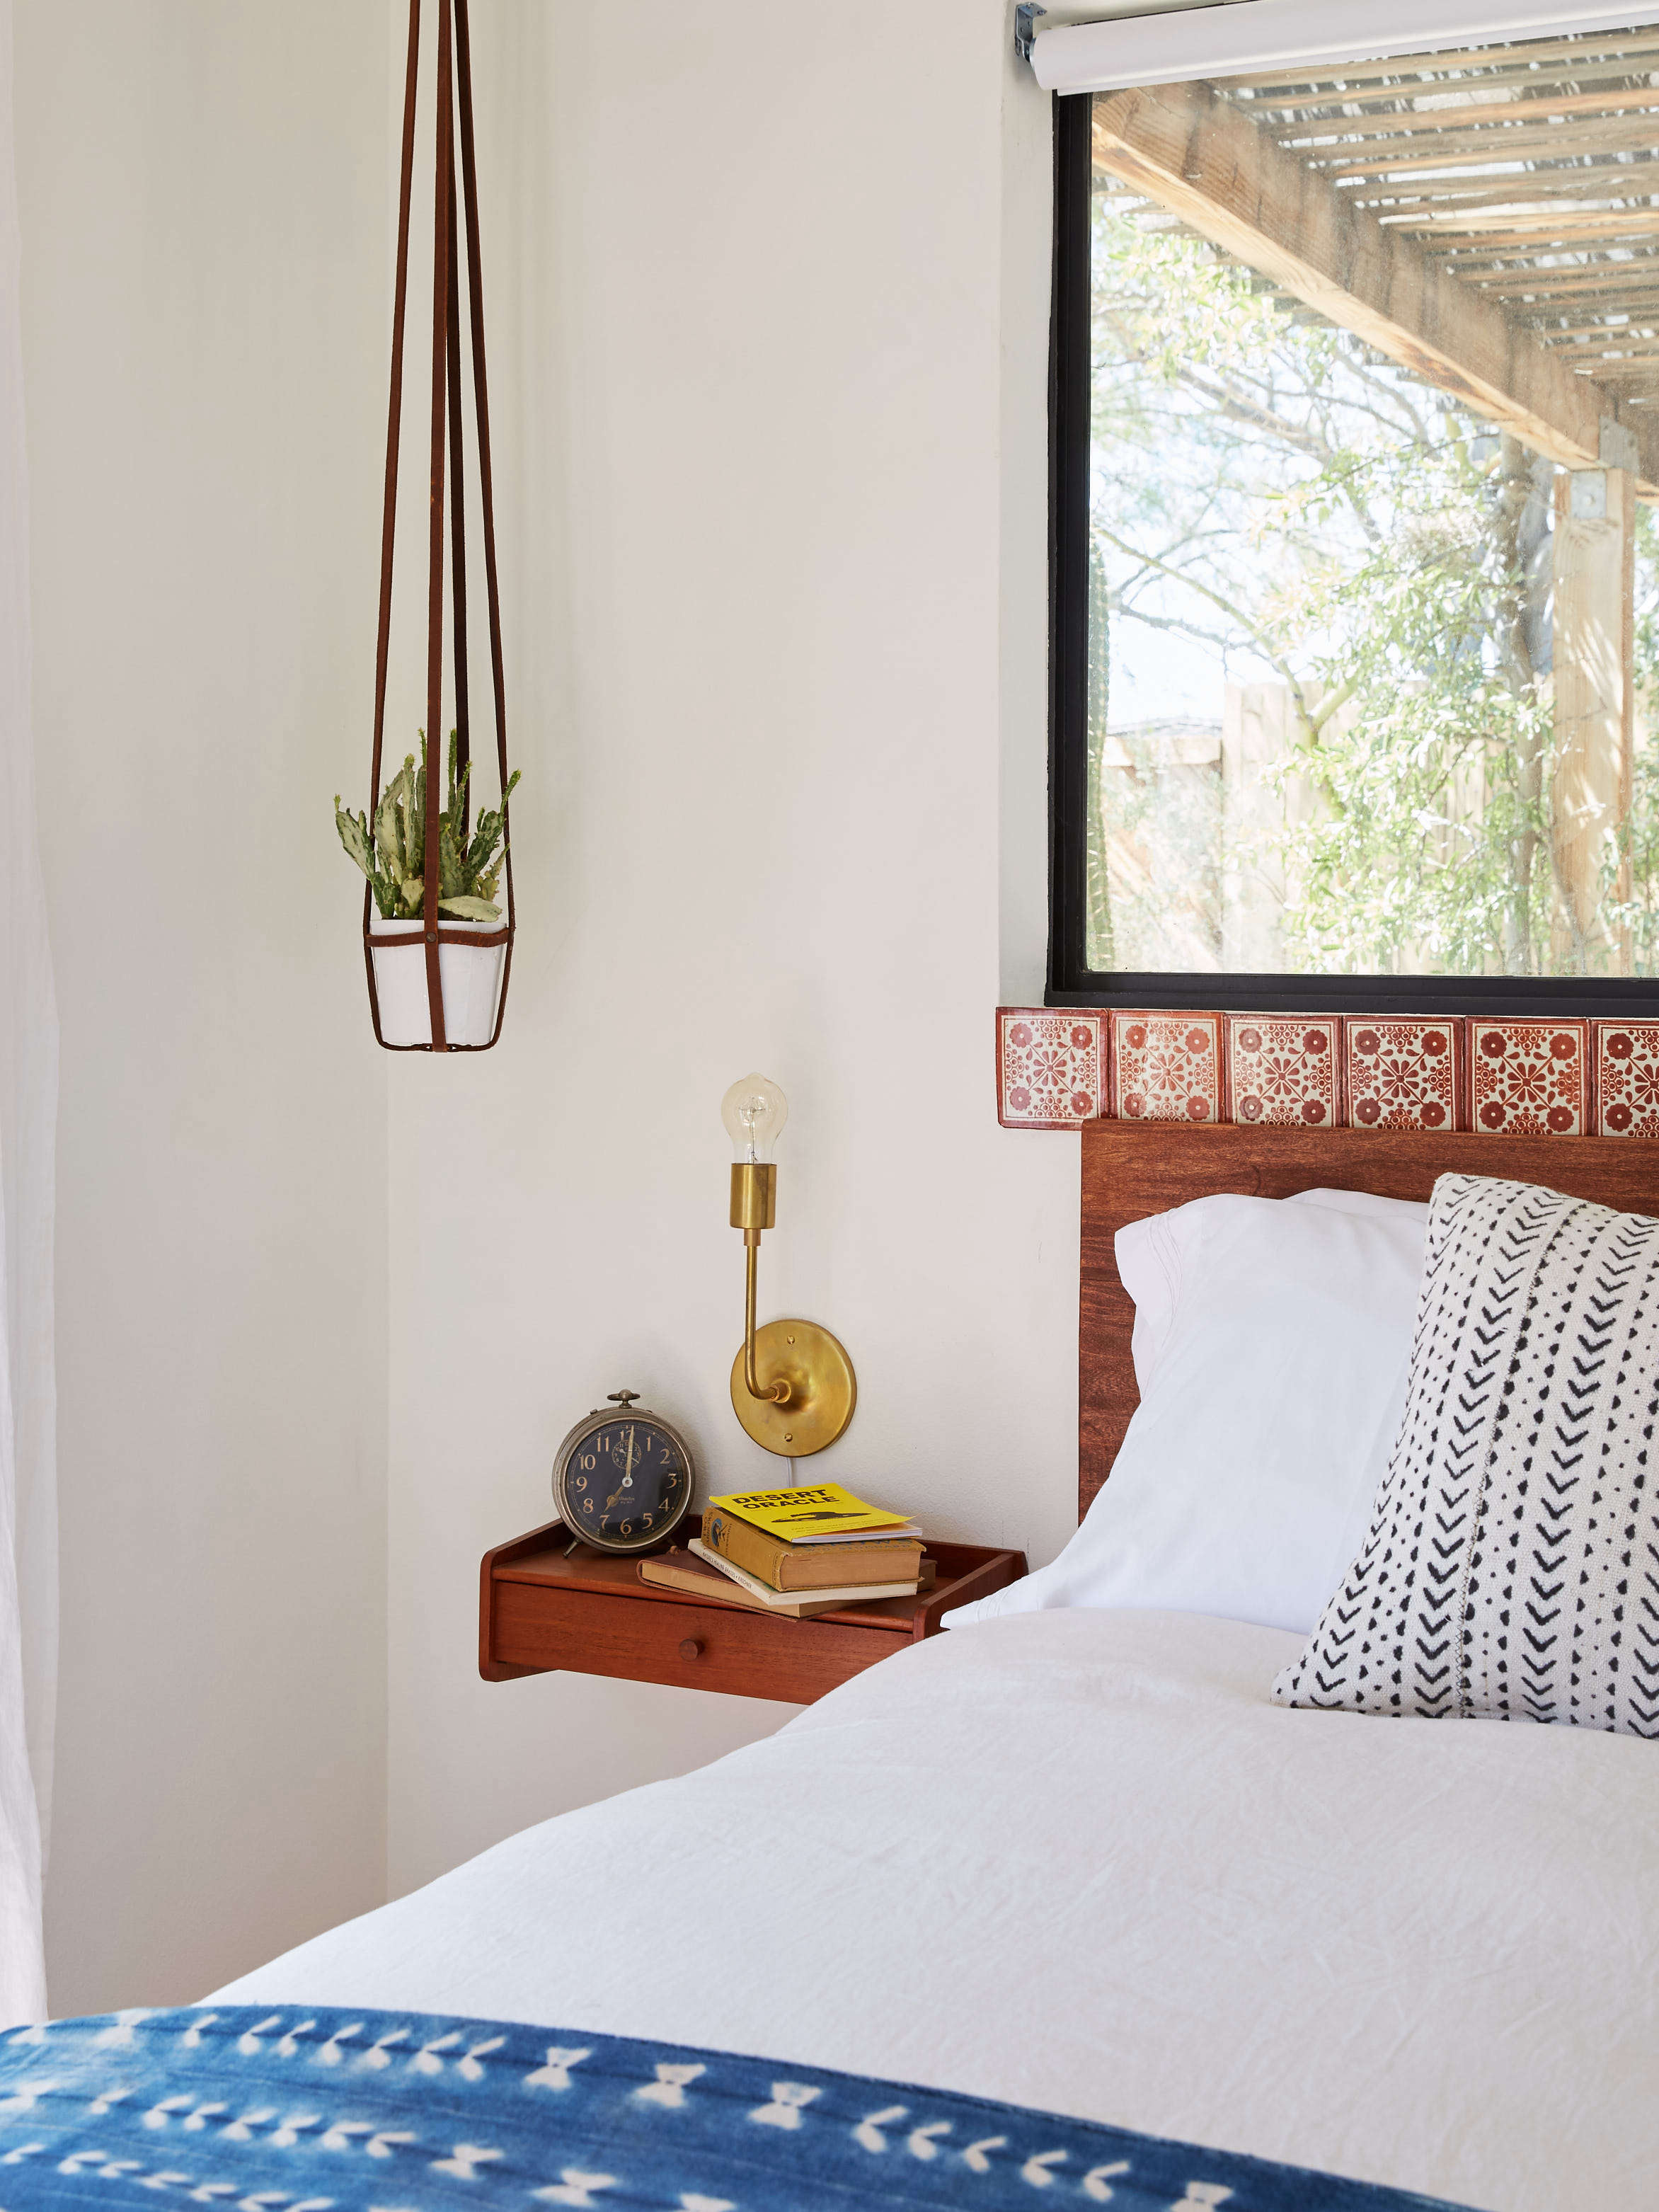 joshua tree casita airbnb bedroom with hanging wood sidetables and tiled headboard/window ledge, kate sears photo